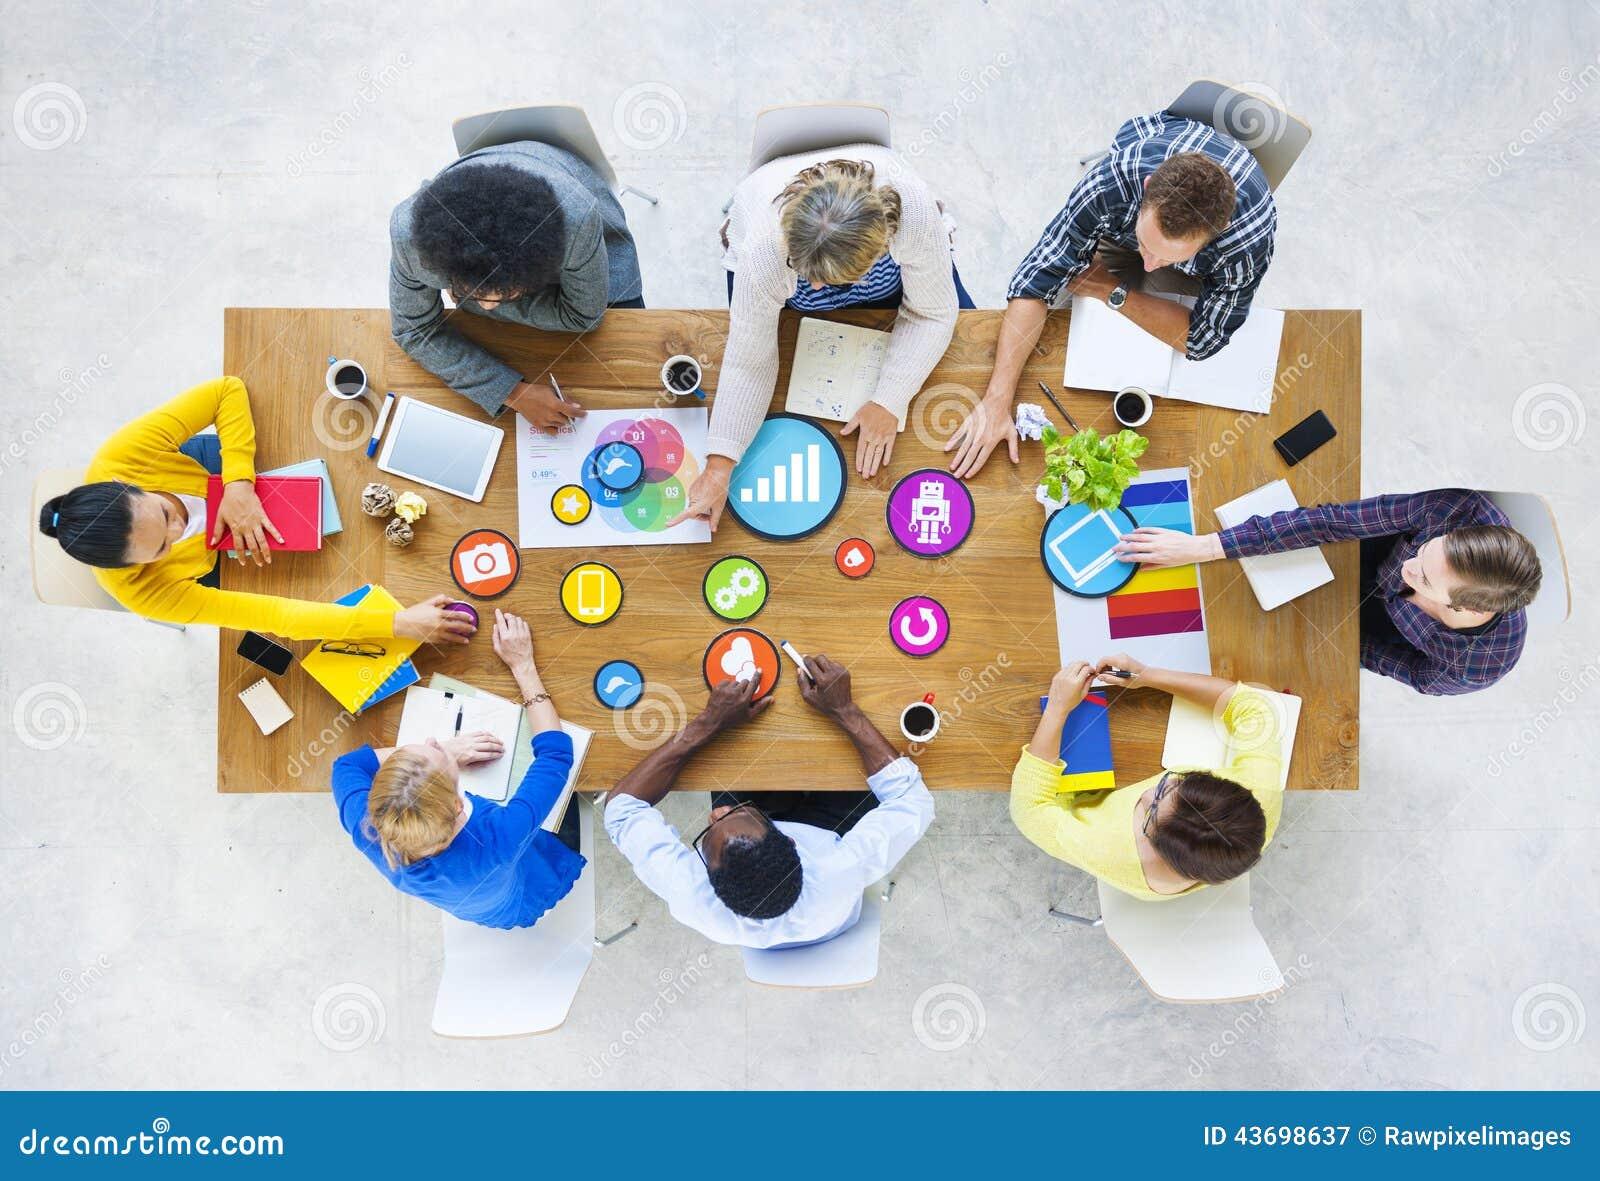 Design Team Planning With Social Media Symbols Stock Illustration Image 43698637